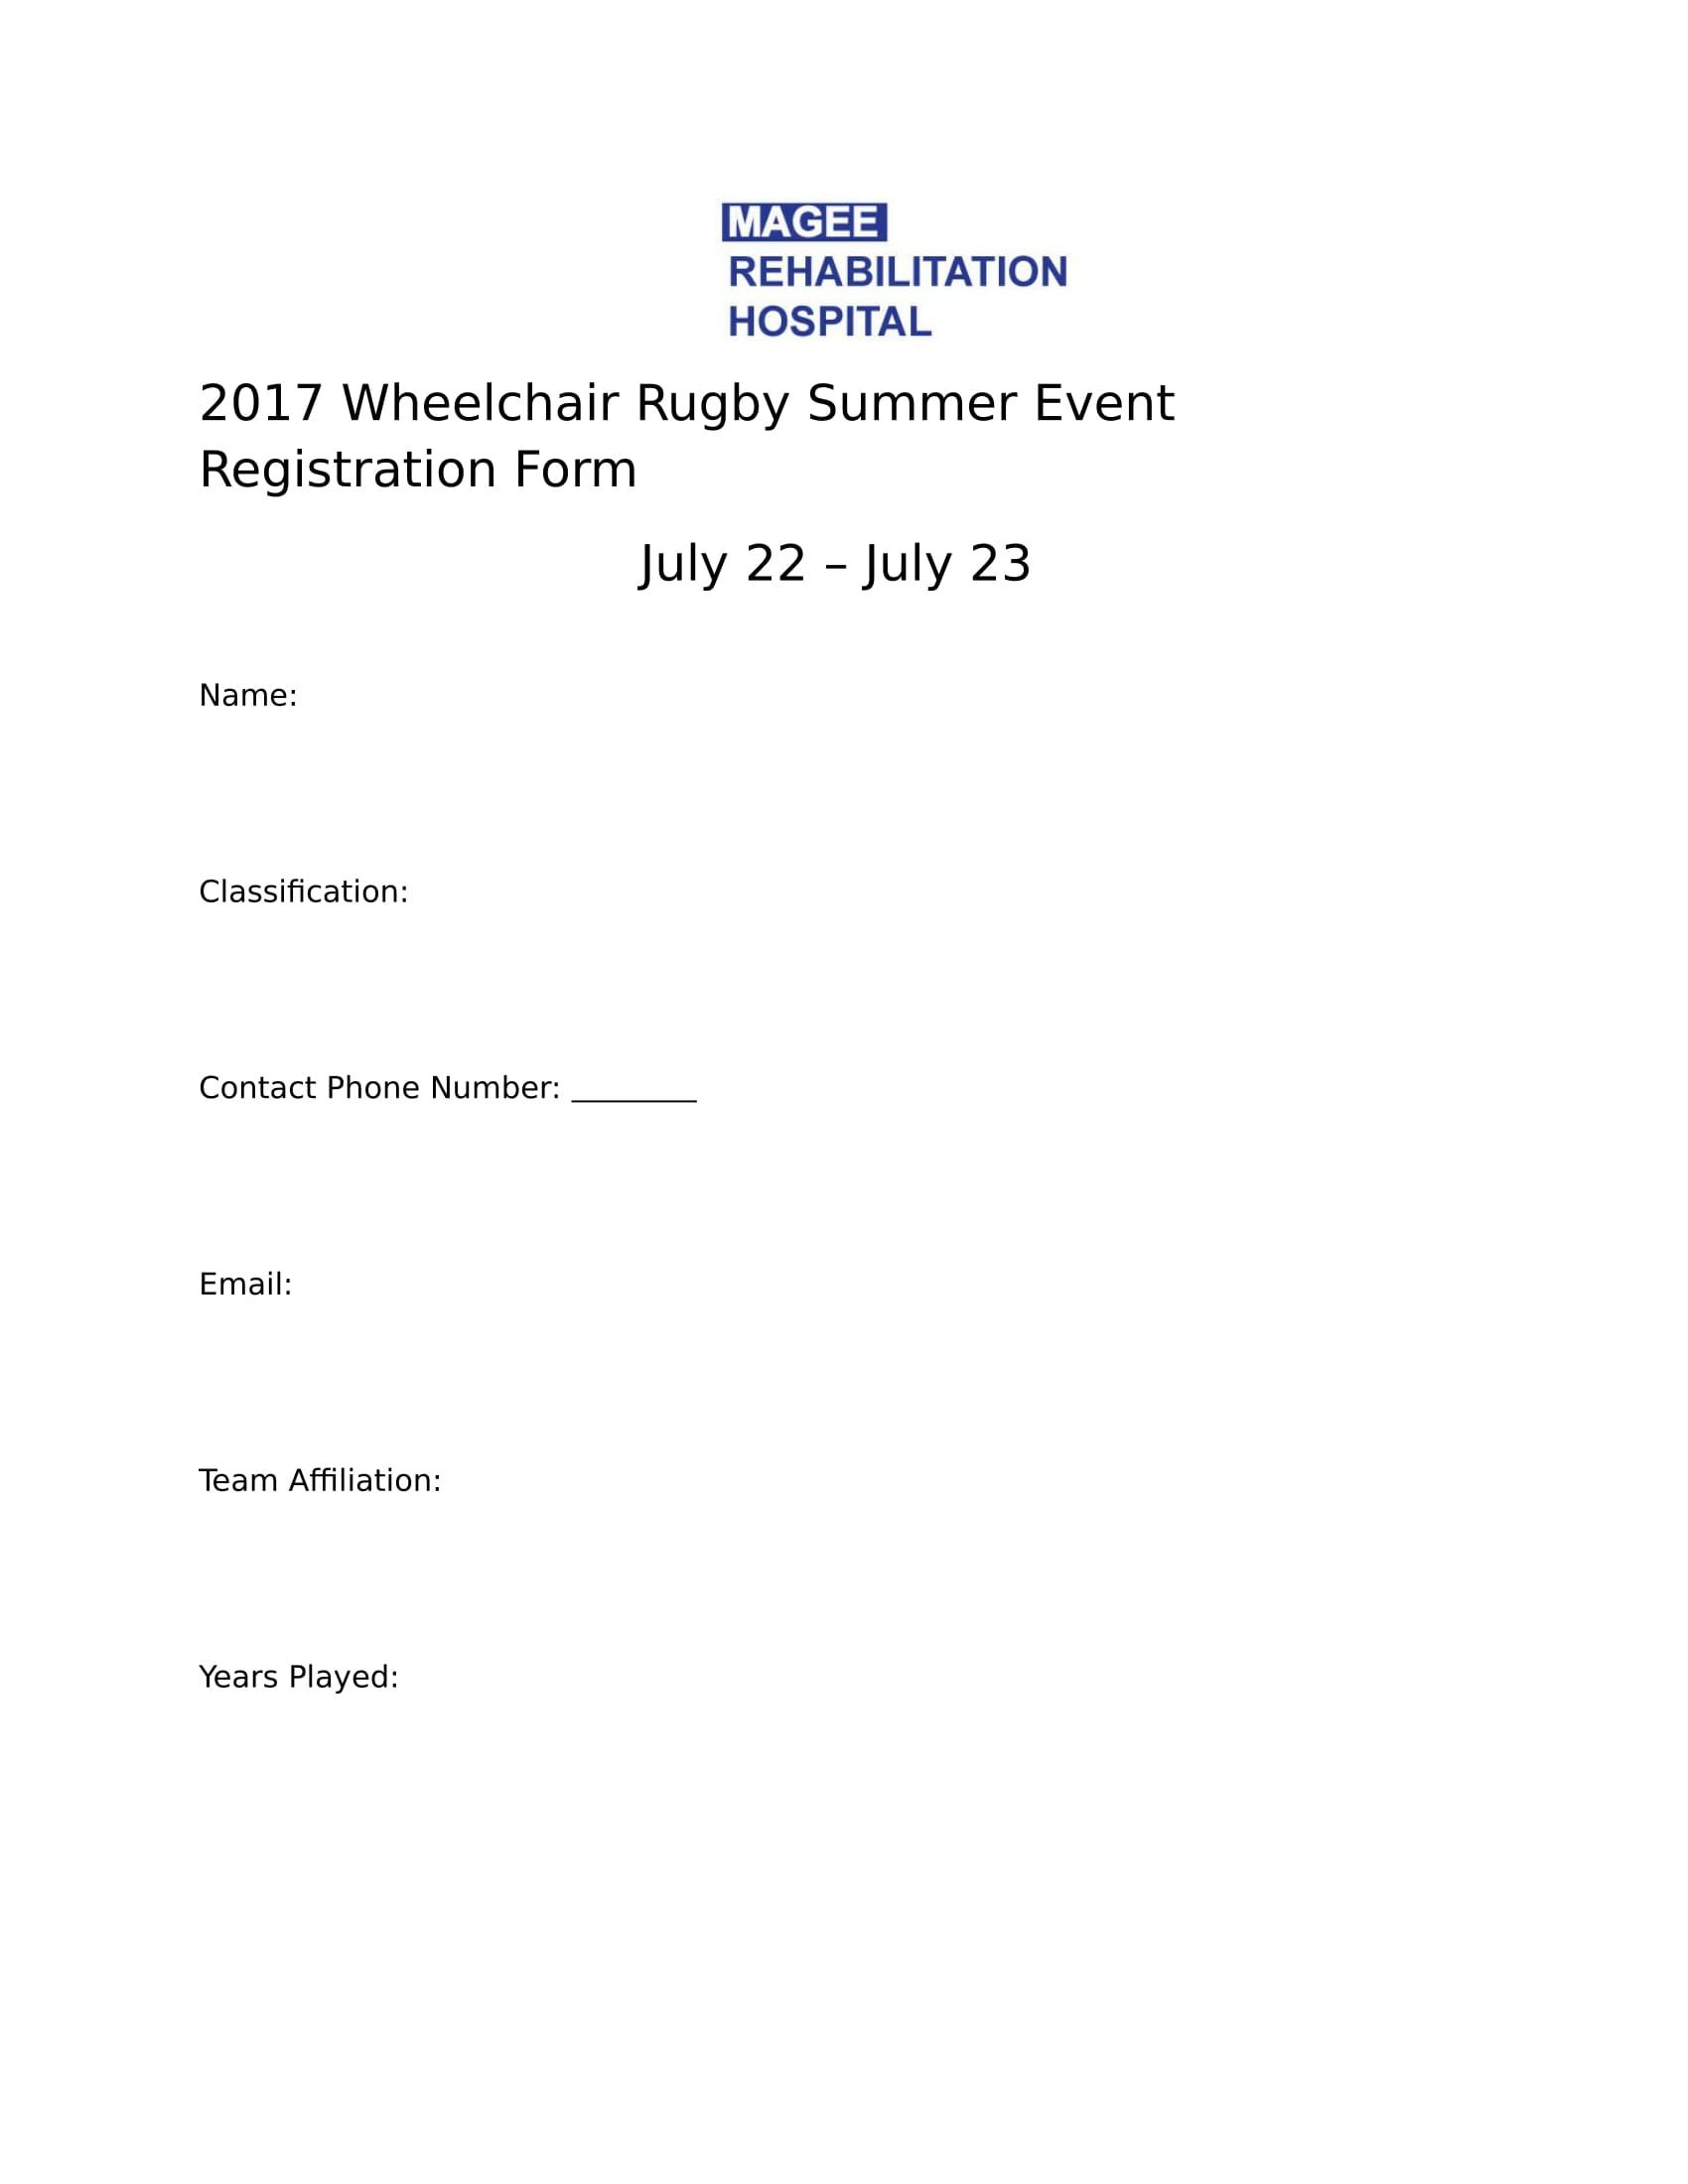 rugby event registration form 1